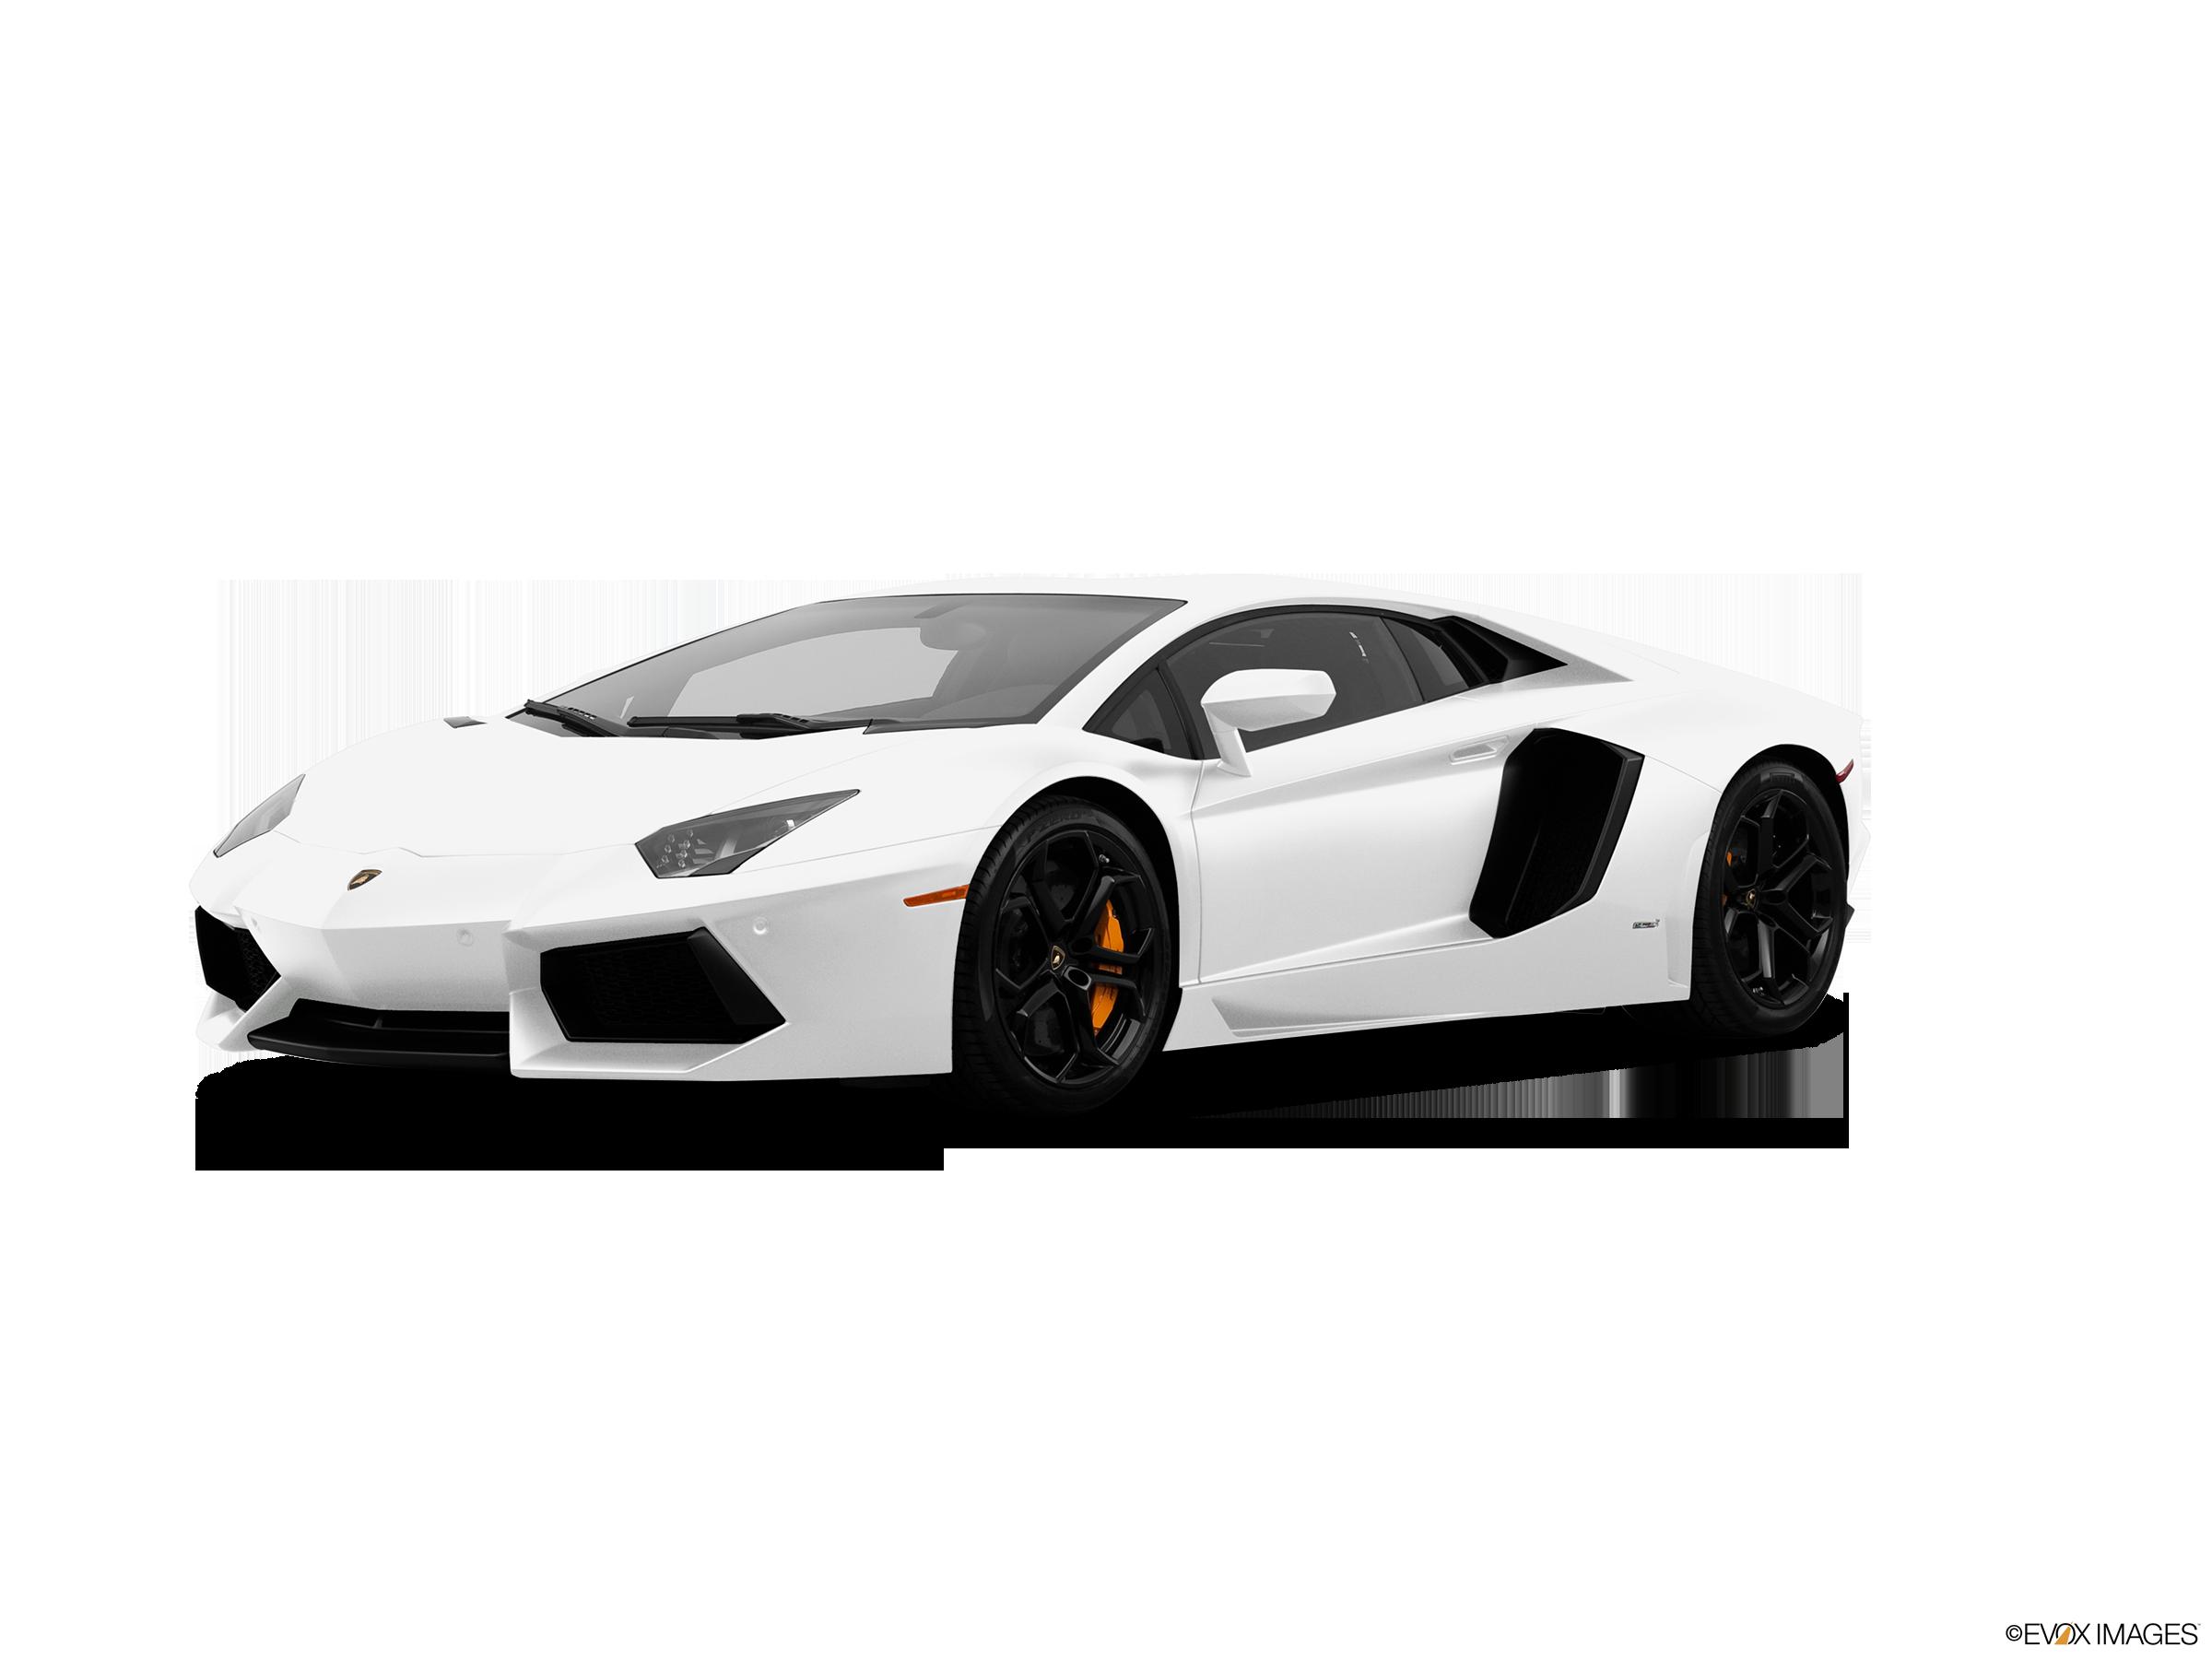 2012 Lamborghini Aventador Values Cars For Sale Kelley Blue Book